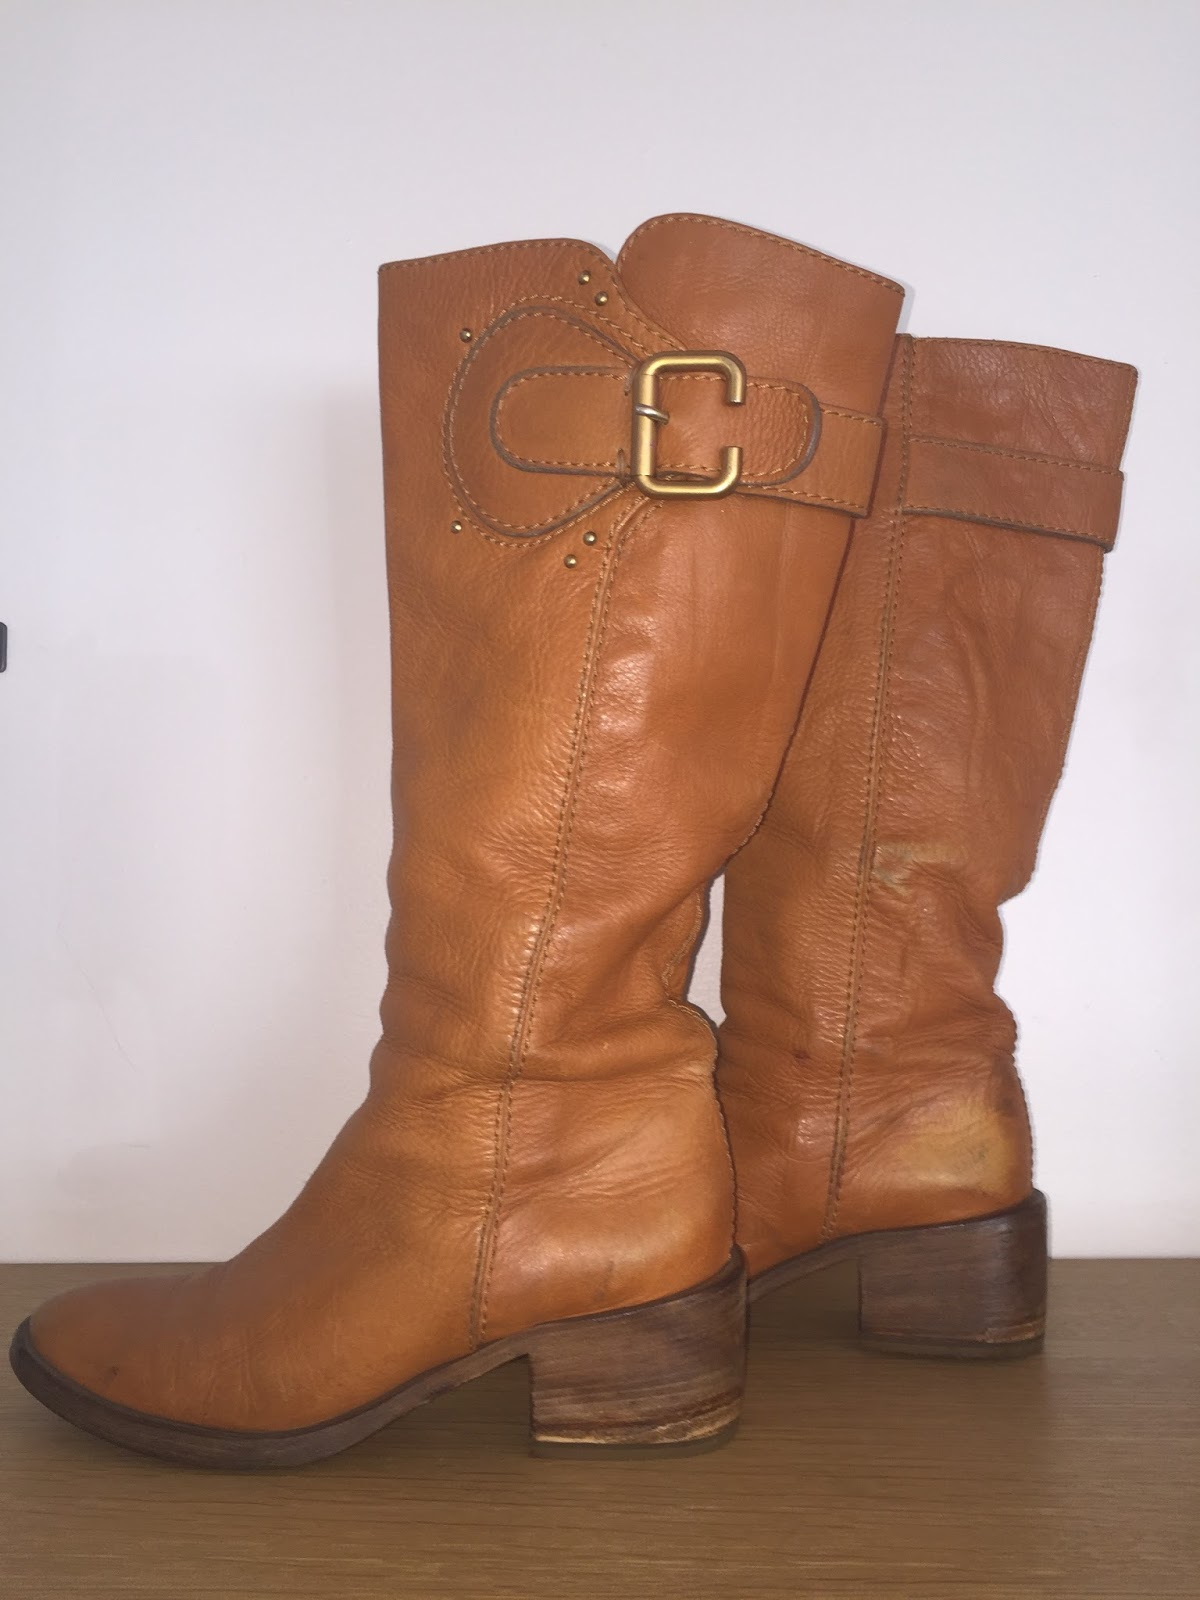 laws of general economy chloe paddington honey leather boots orig 1150. Black Bedroom Furniture Sets. Home Design Ideas